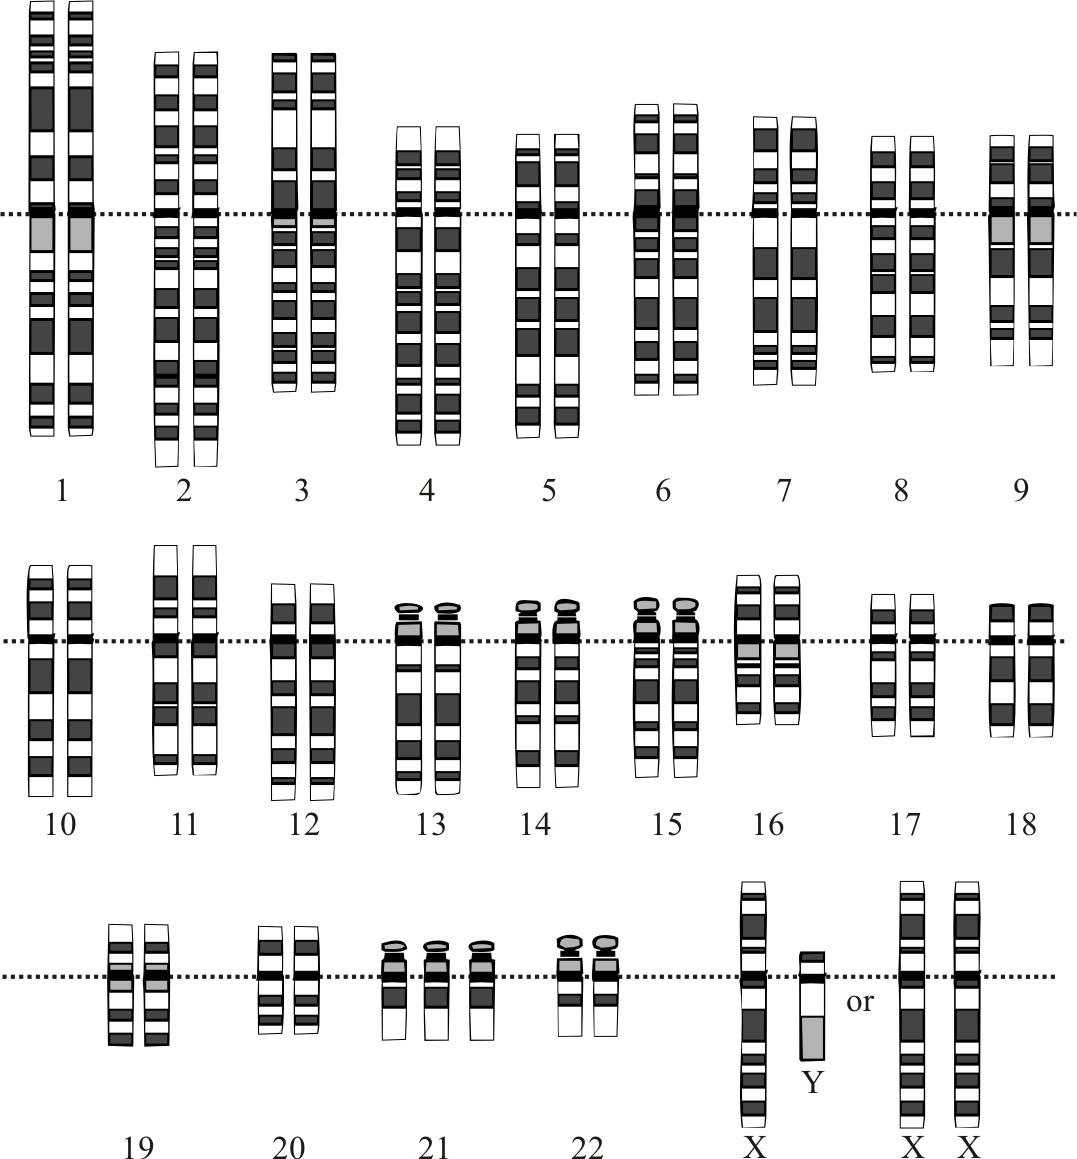 File Down Syndrome Karyotype